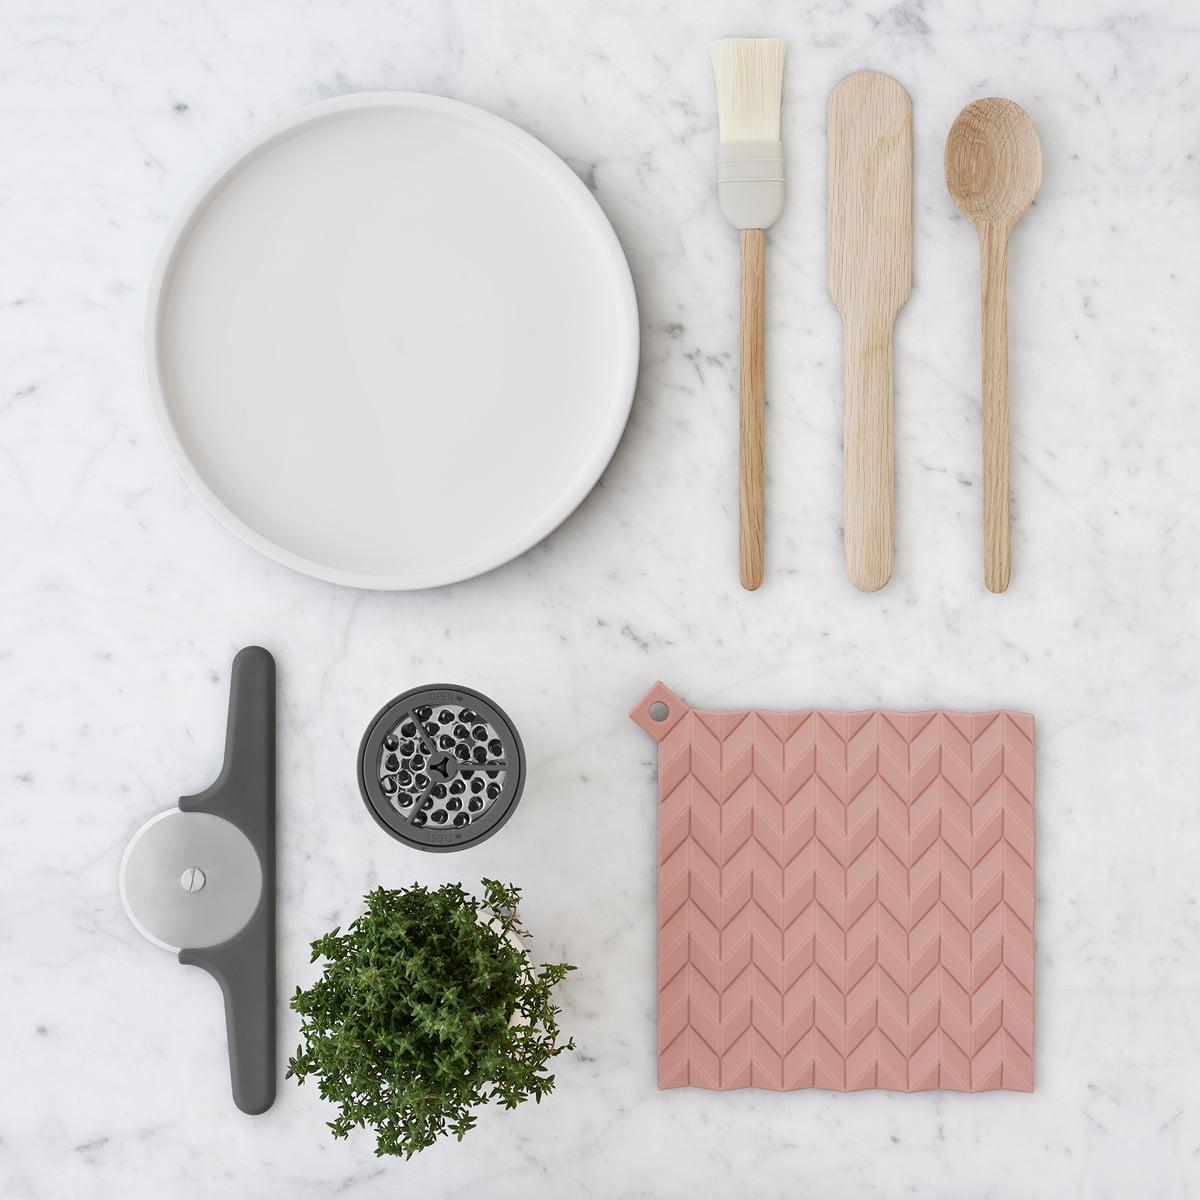 Https Categories Home Textiles Kitchen Linen Sponn Cat Kuku Rig Tig By Stelton Hold On Topflappen Slice It Pizzaschneider Situation